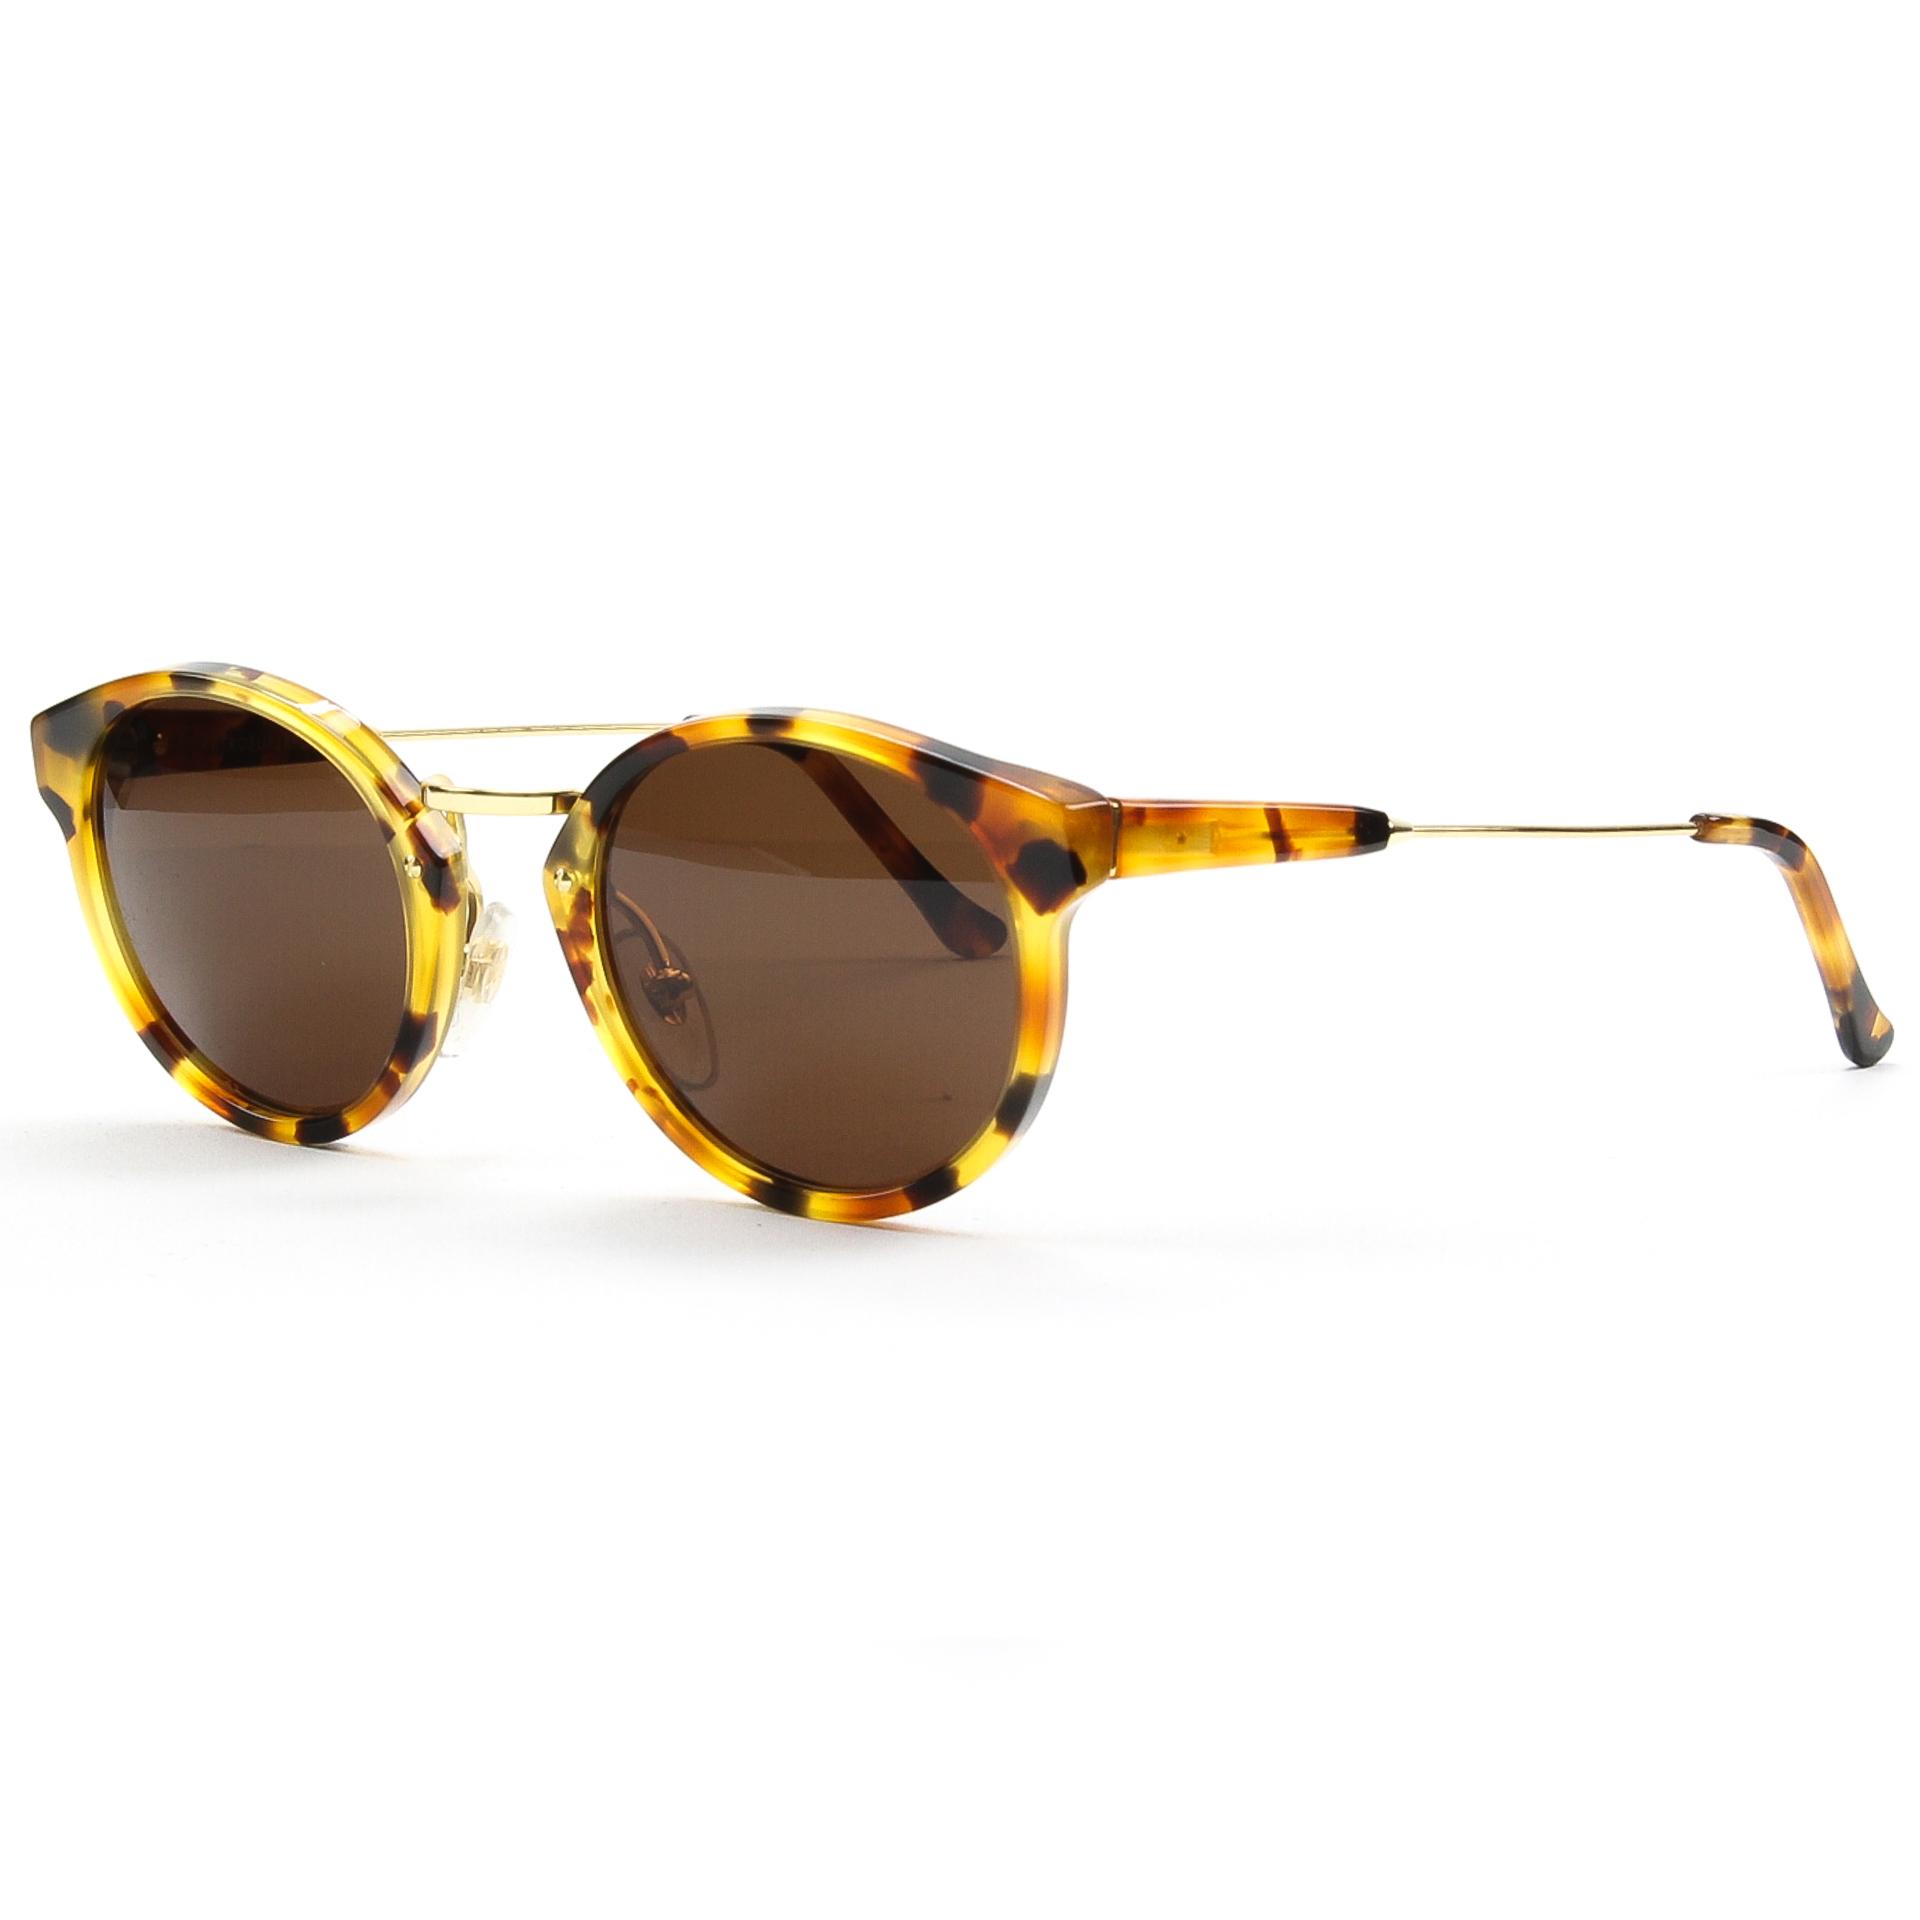 eec1a610a76a RETROSUPERFUTURE Super Panama Sunglasses SU476 Dark Havana Brown Tortoise  Zeiss